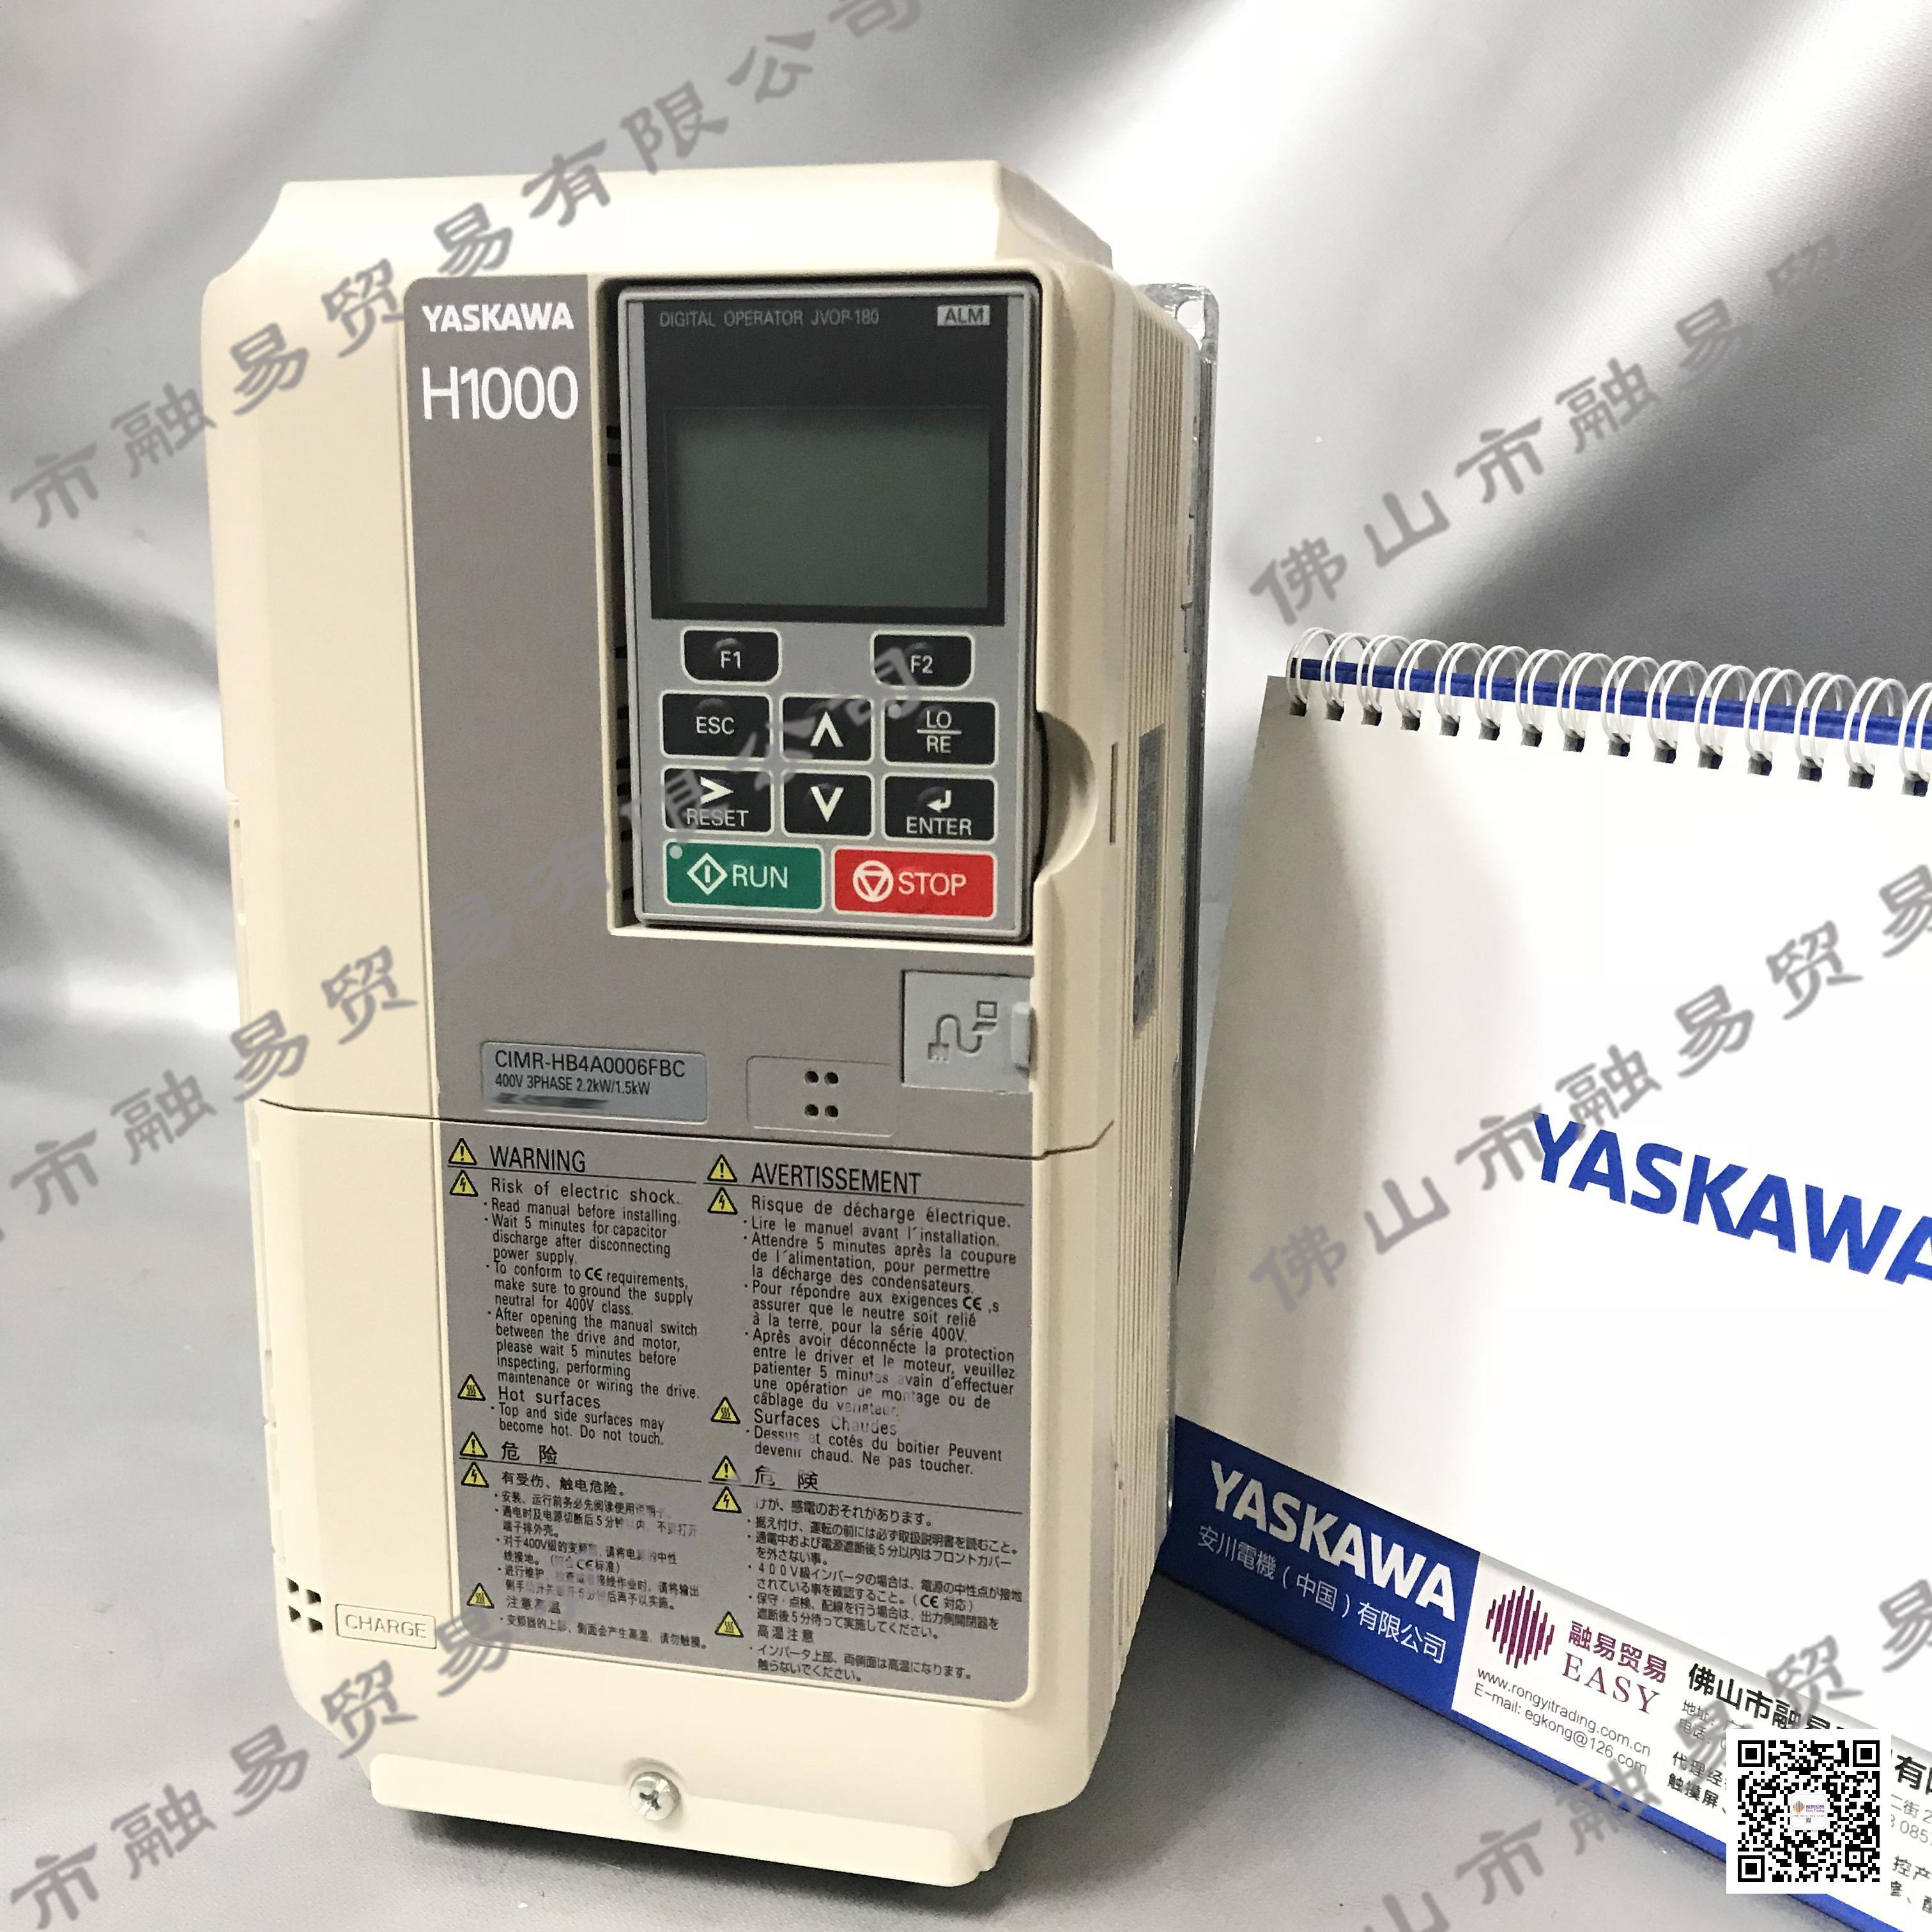 安川变频器H1000 CIMR-HB4A0006FBC 1.5KW/2.2KW 380V